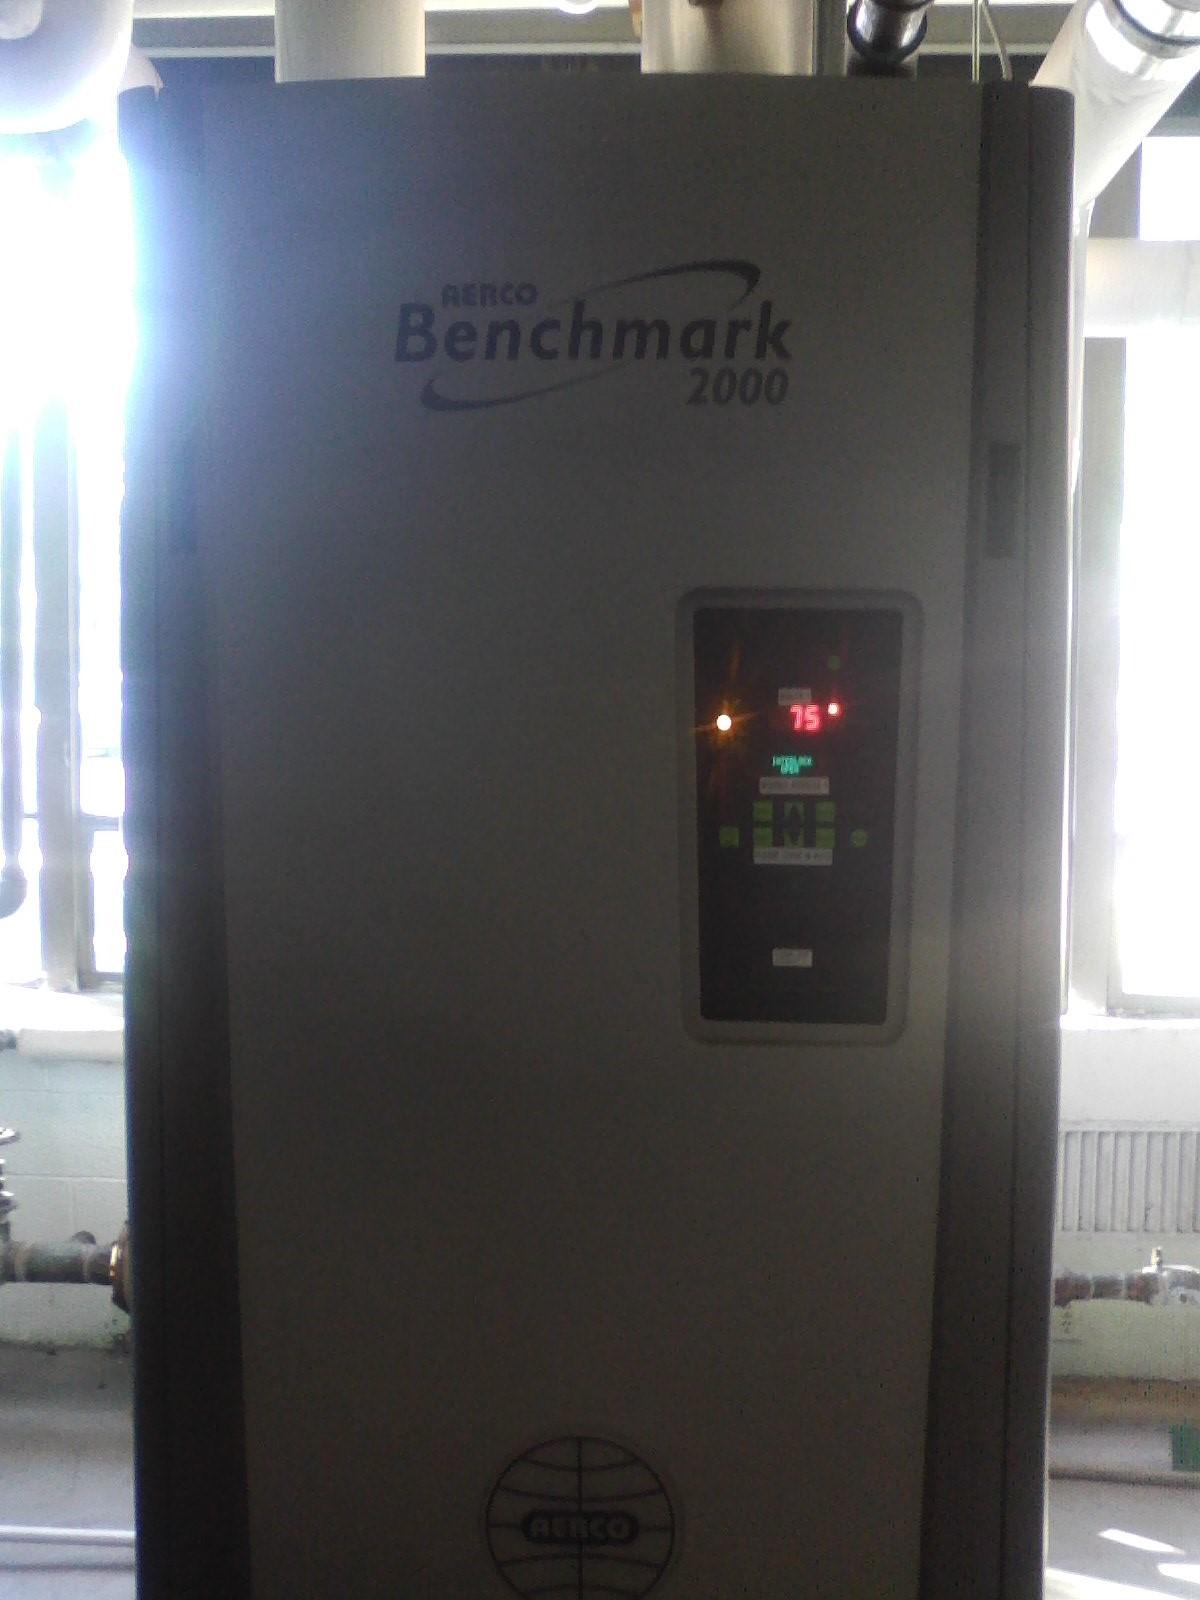 Benchmark 2000 Boiler 1